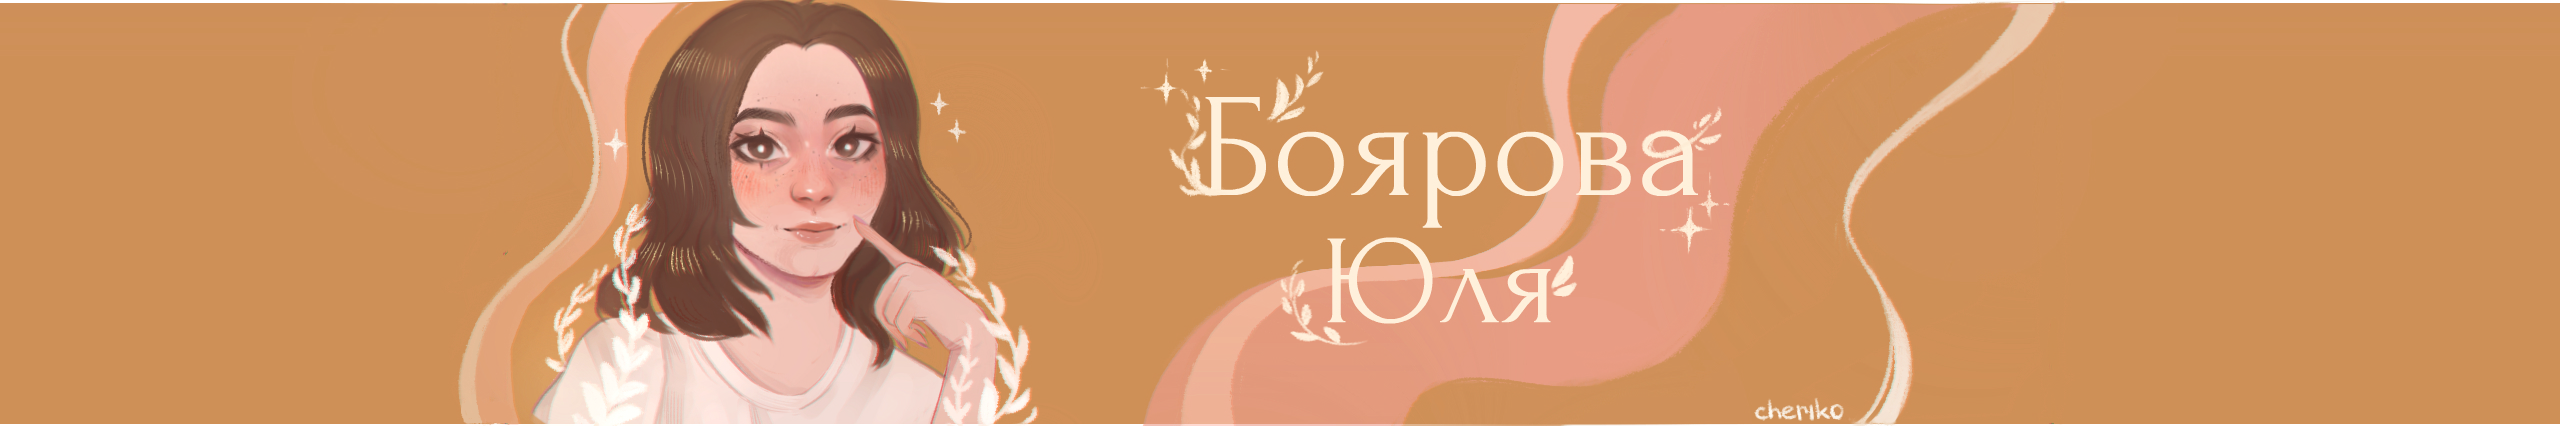 creator cover Юля Боярова